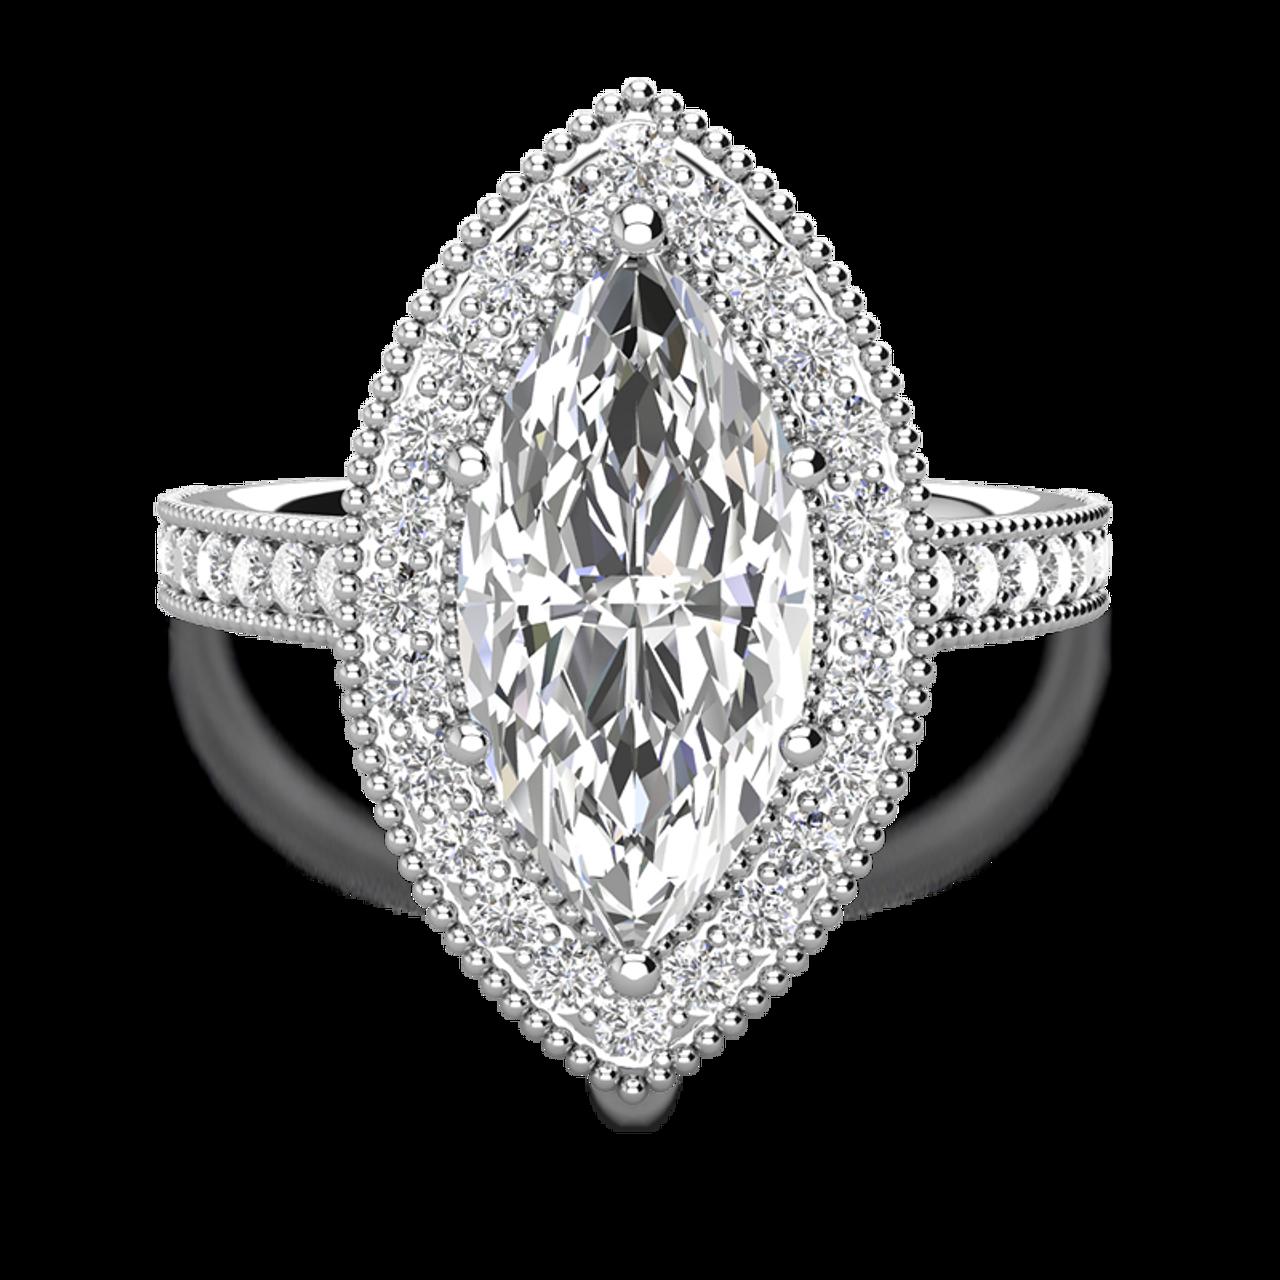 da0aad8d9c2ad Laura Preshong | Custom Marquise Halo Engagement Ring